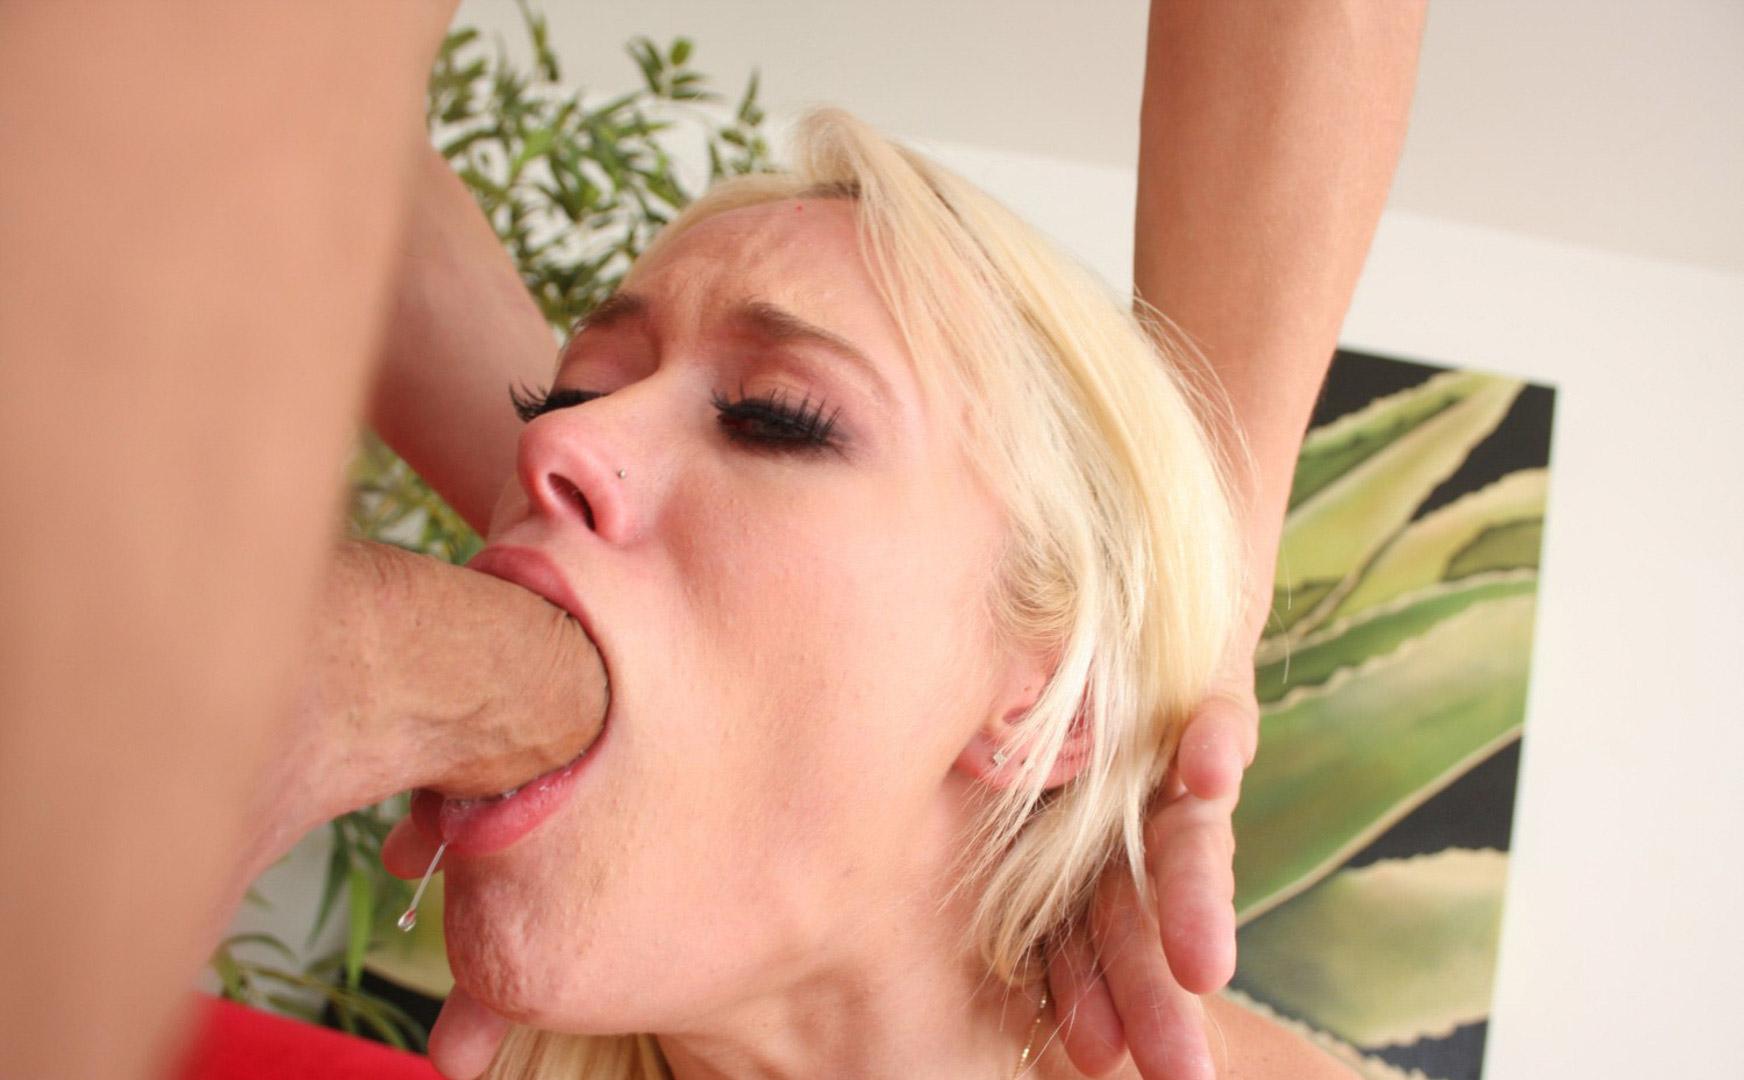 Hot blonde cam babe amazing sloppy deep throat blowjob on a dildo